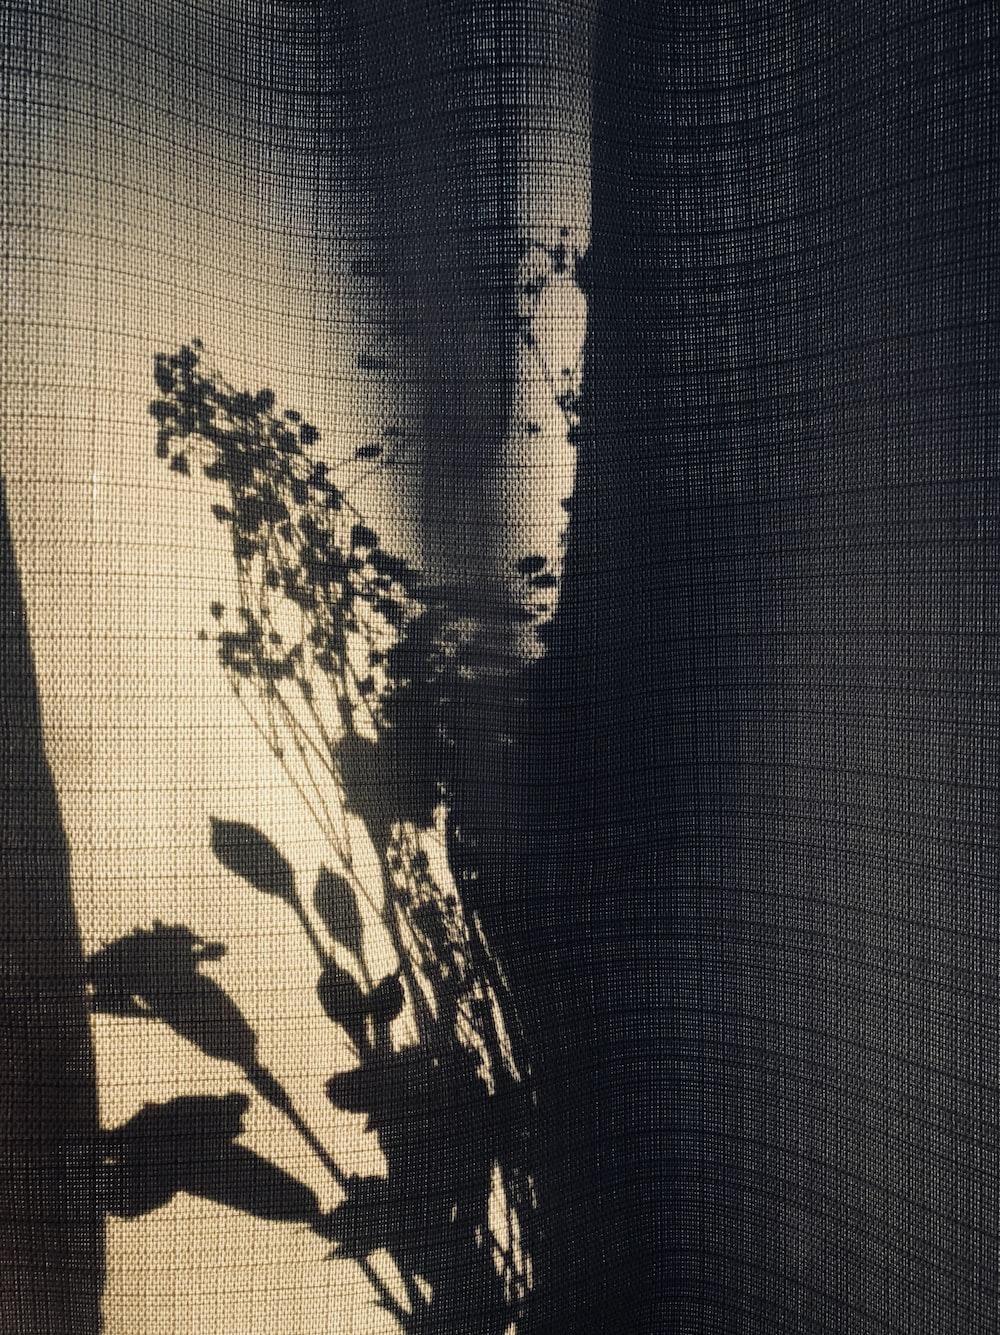 shadow of flowers